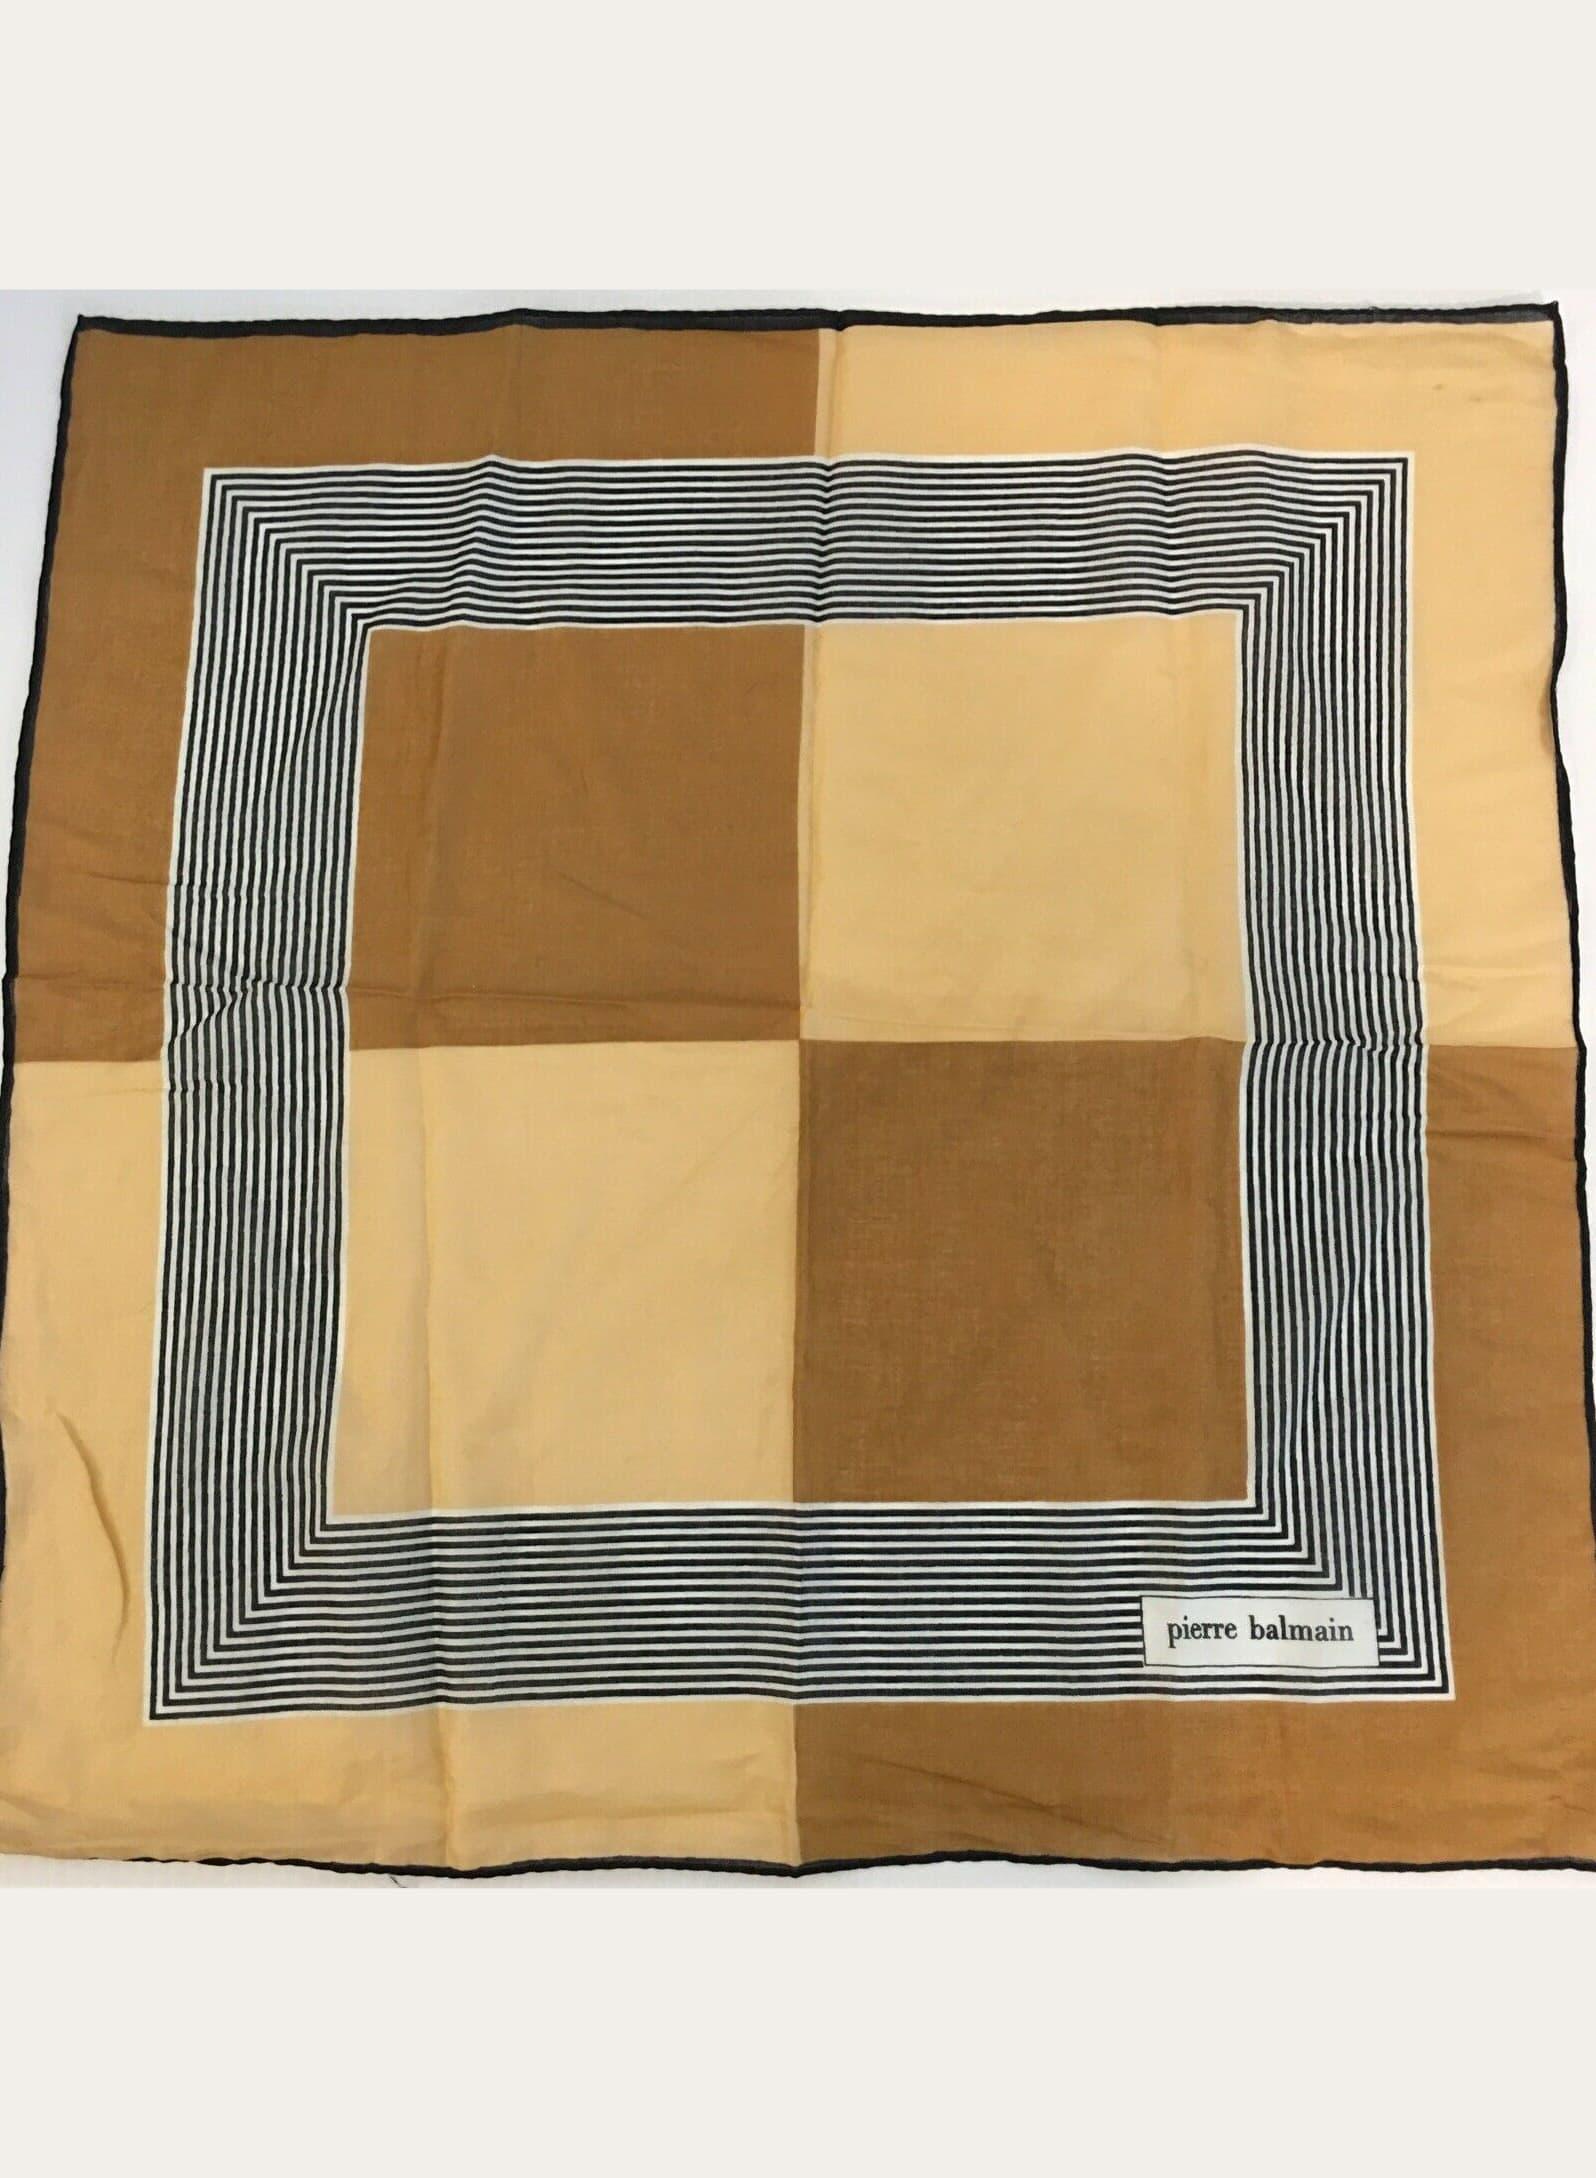 Pierre Balmain Vintage Scarf Designer Silk Abstract Print Black White Gold